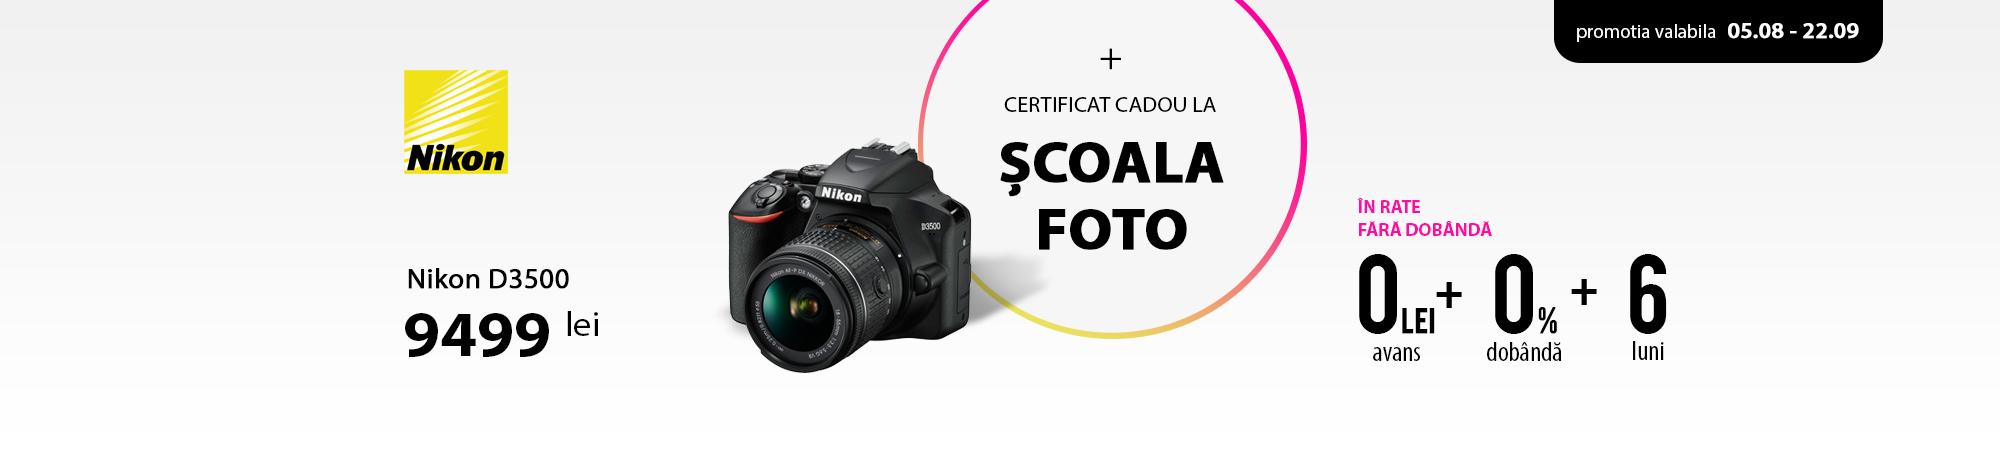 Nikon D3500 - Promo